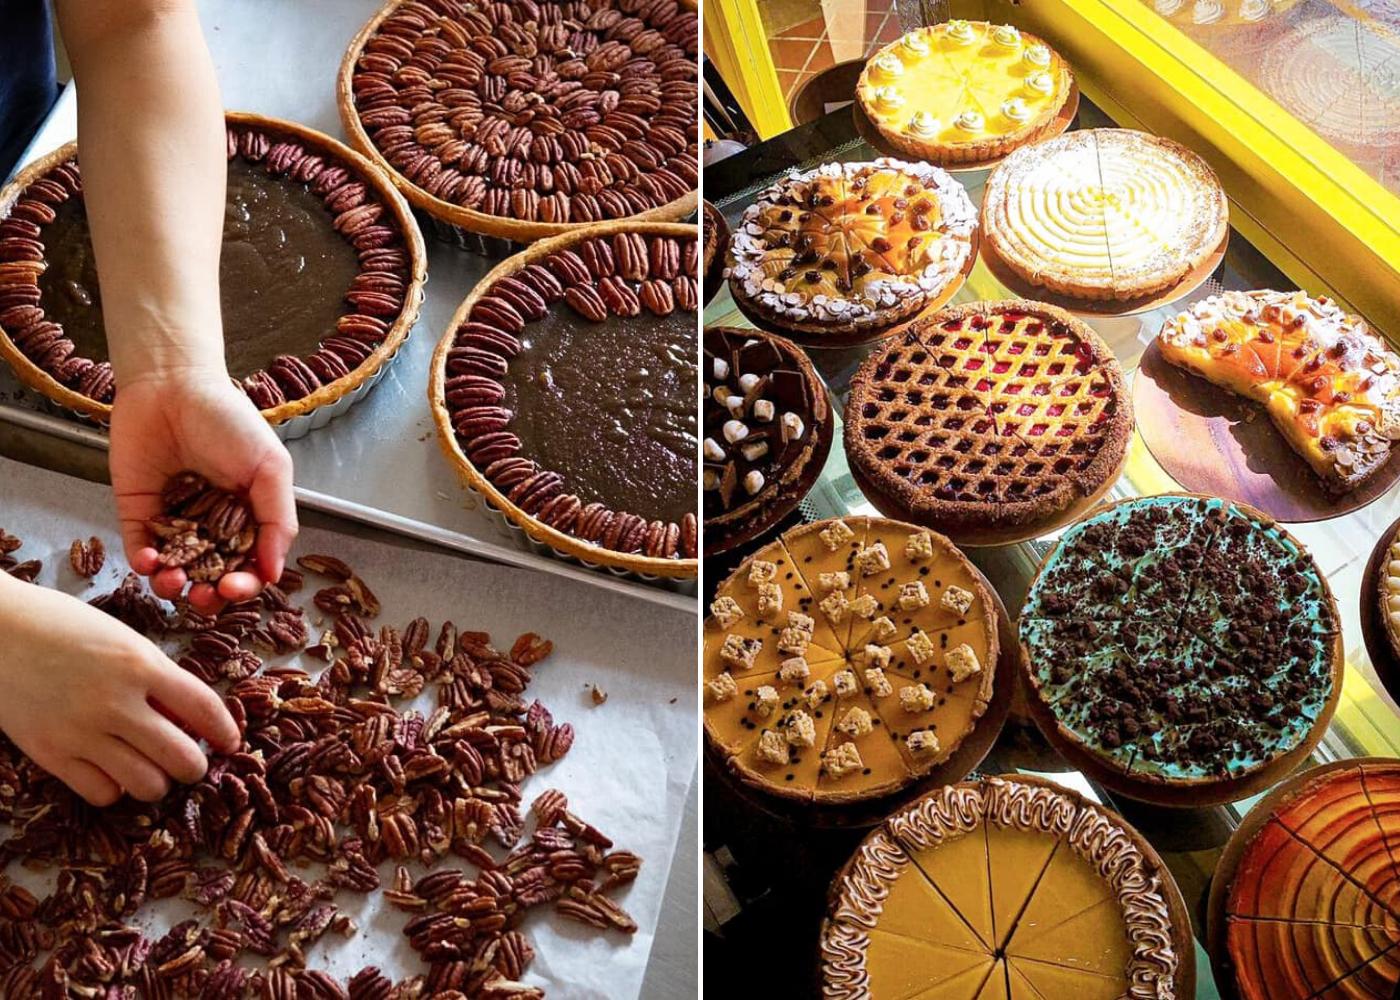 Windowsill-Pies